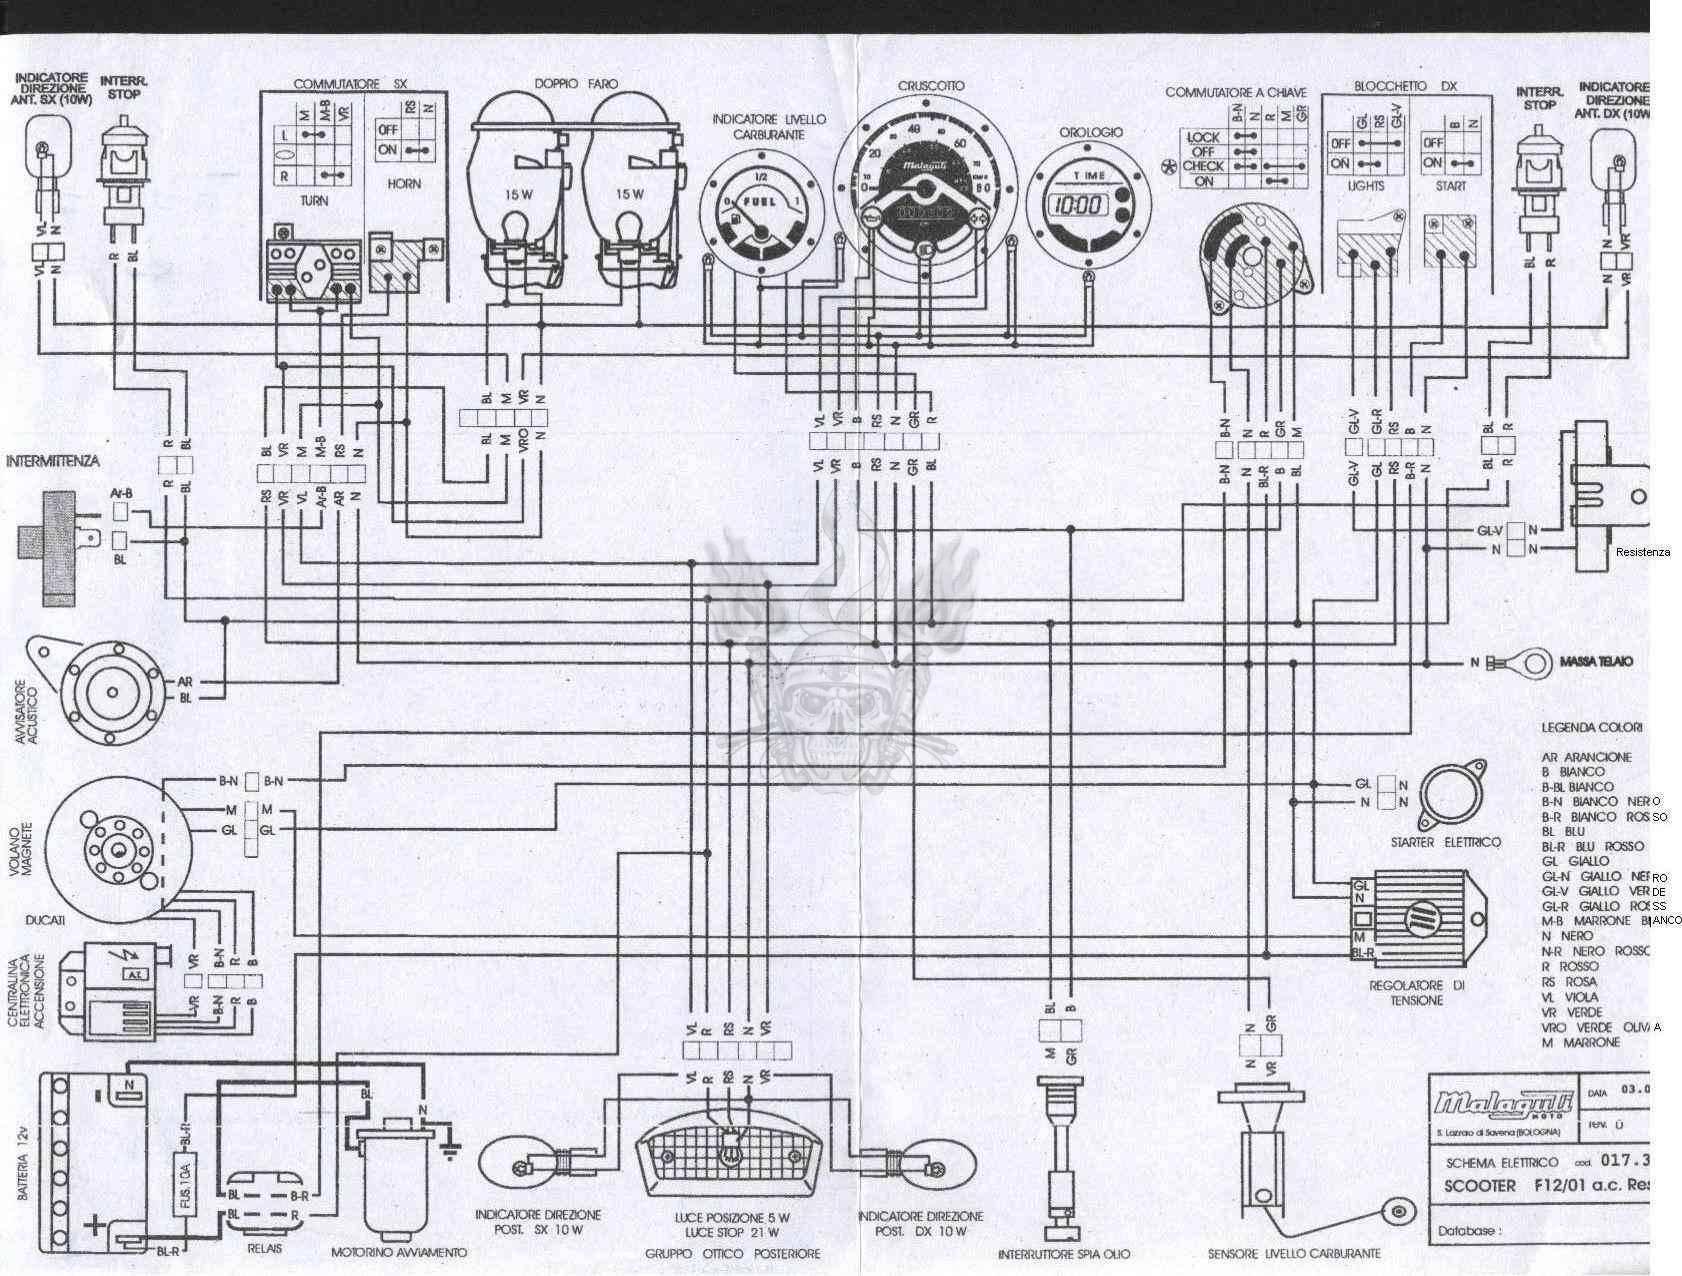 vento phantom scooter wiring diagram electrical work wiring diagram u2022 rh aglabs co